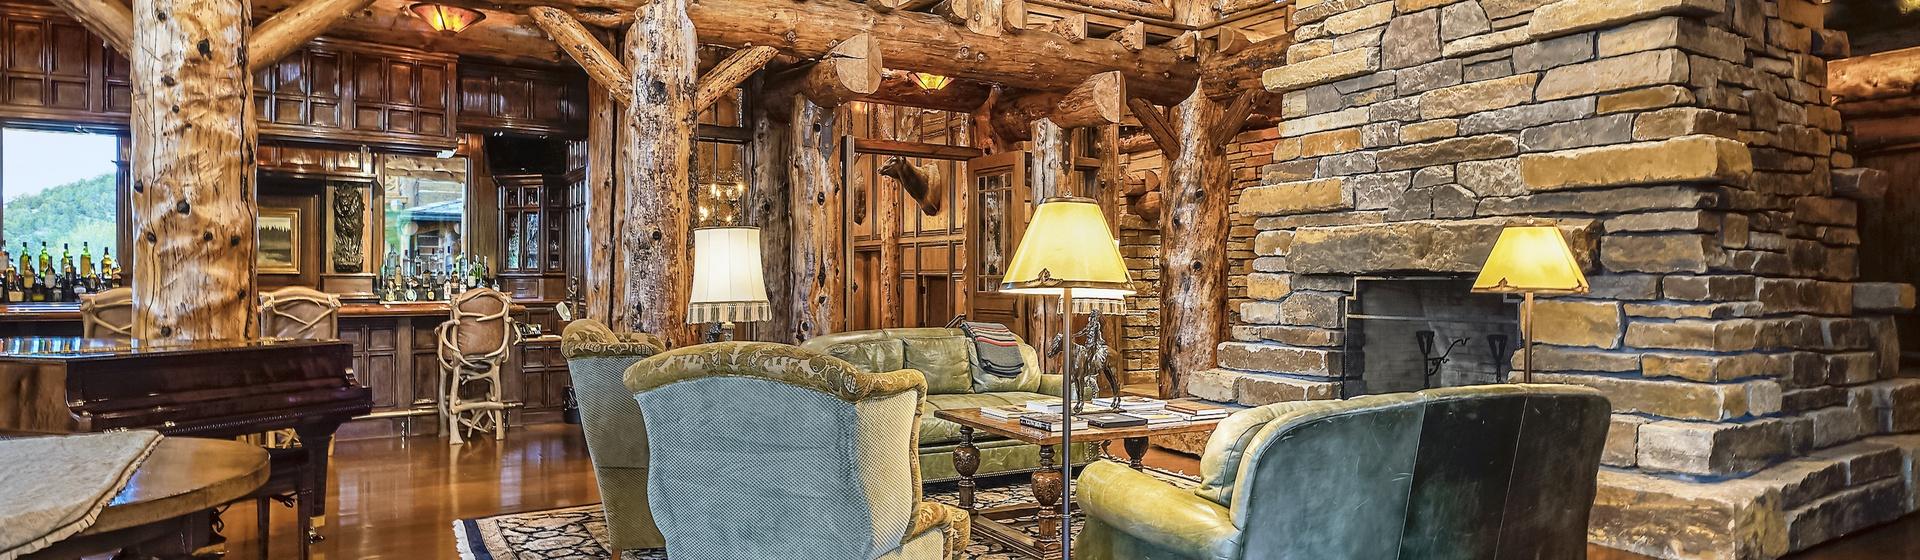 1.3-Telluride-Sleeping-Indian-Ranch-living-room-fireplace-2-web.JPG